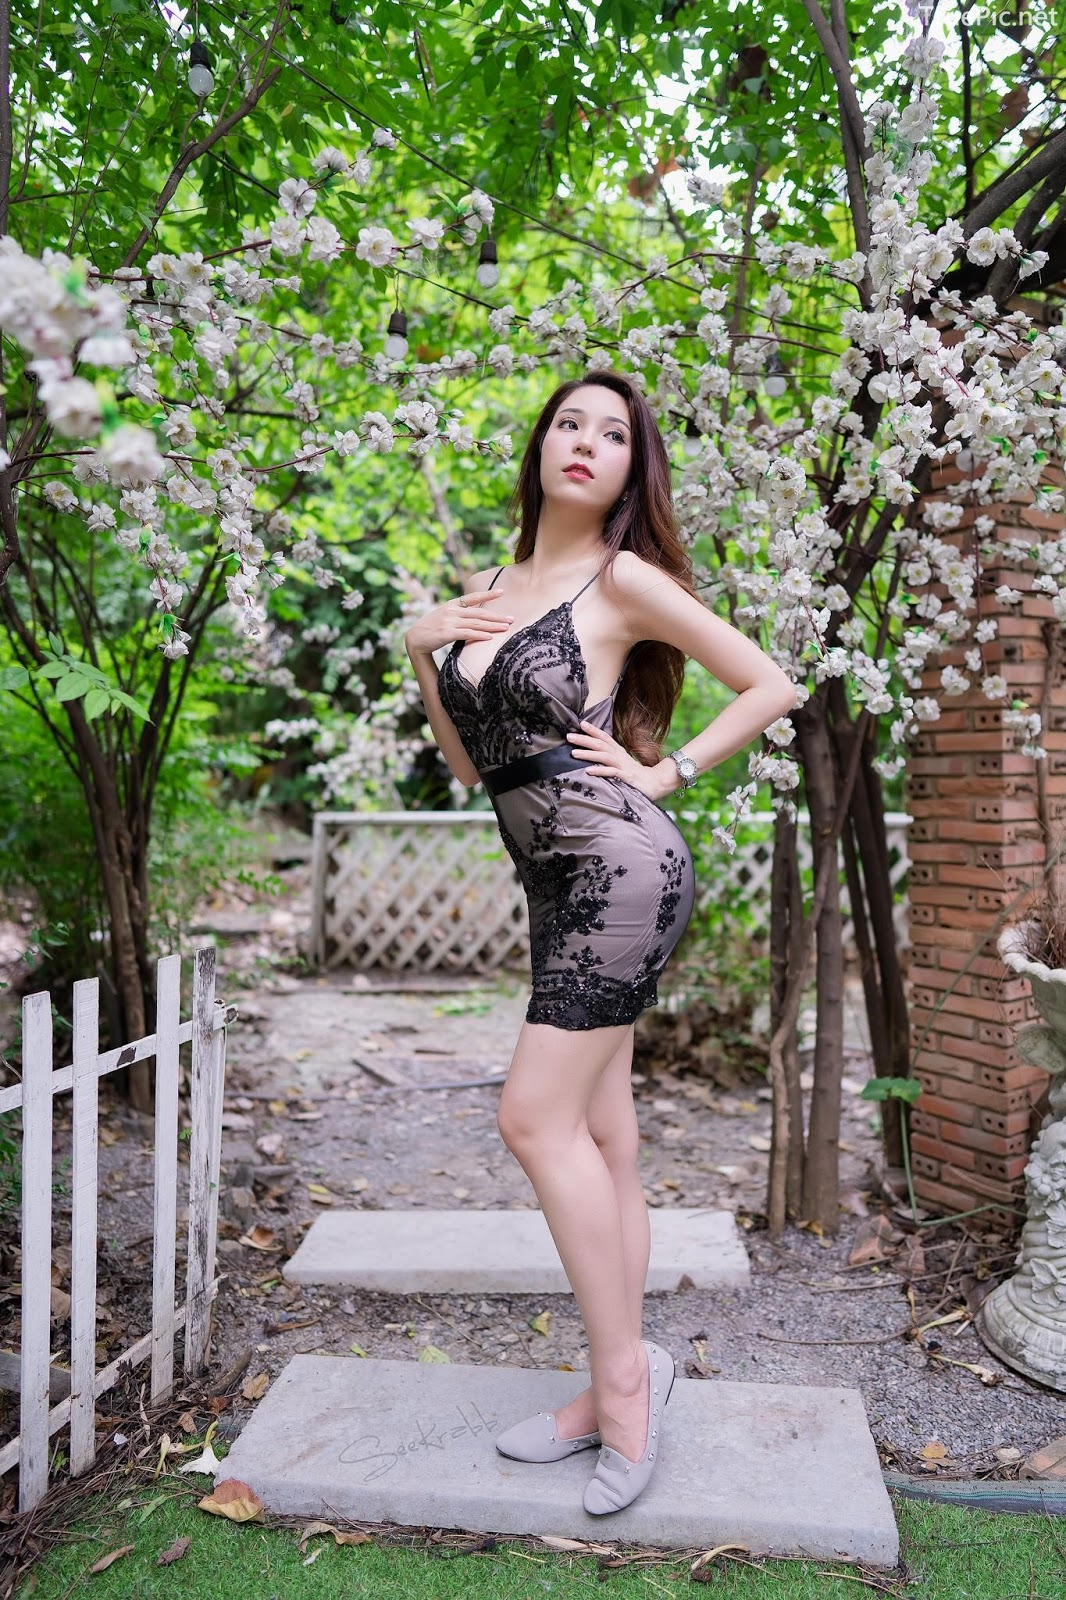 Thailand hot model - Janet Kanokwan Saesim - Black sexy garden - TruePic.net - Picture 2